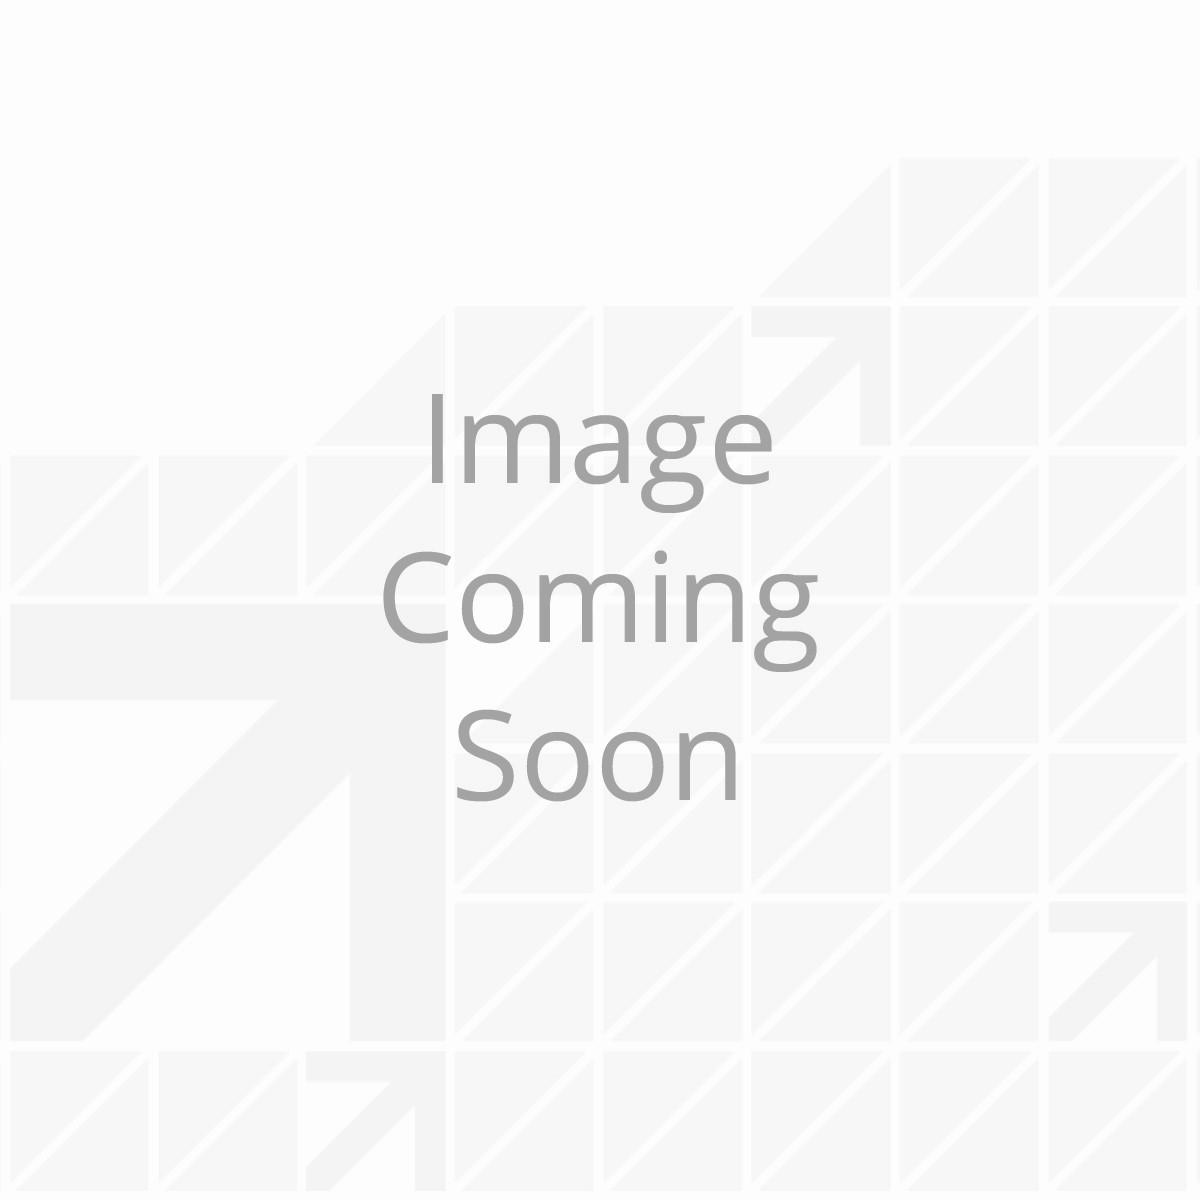 367302_Bearing-Sleeve_001